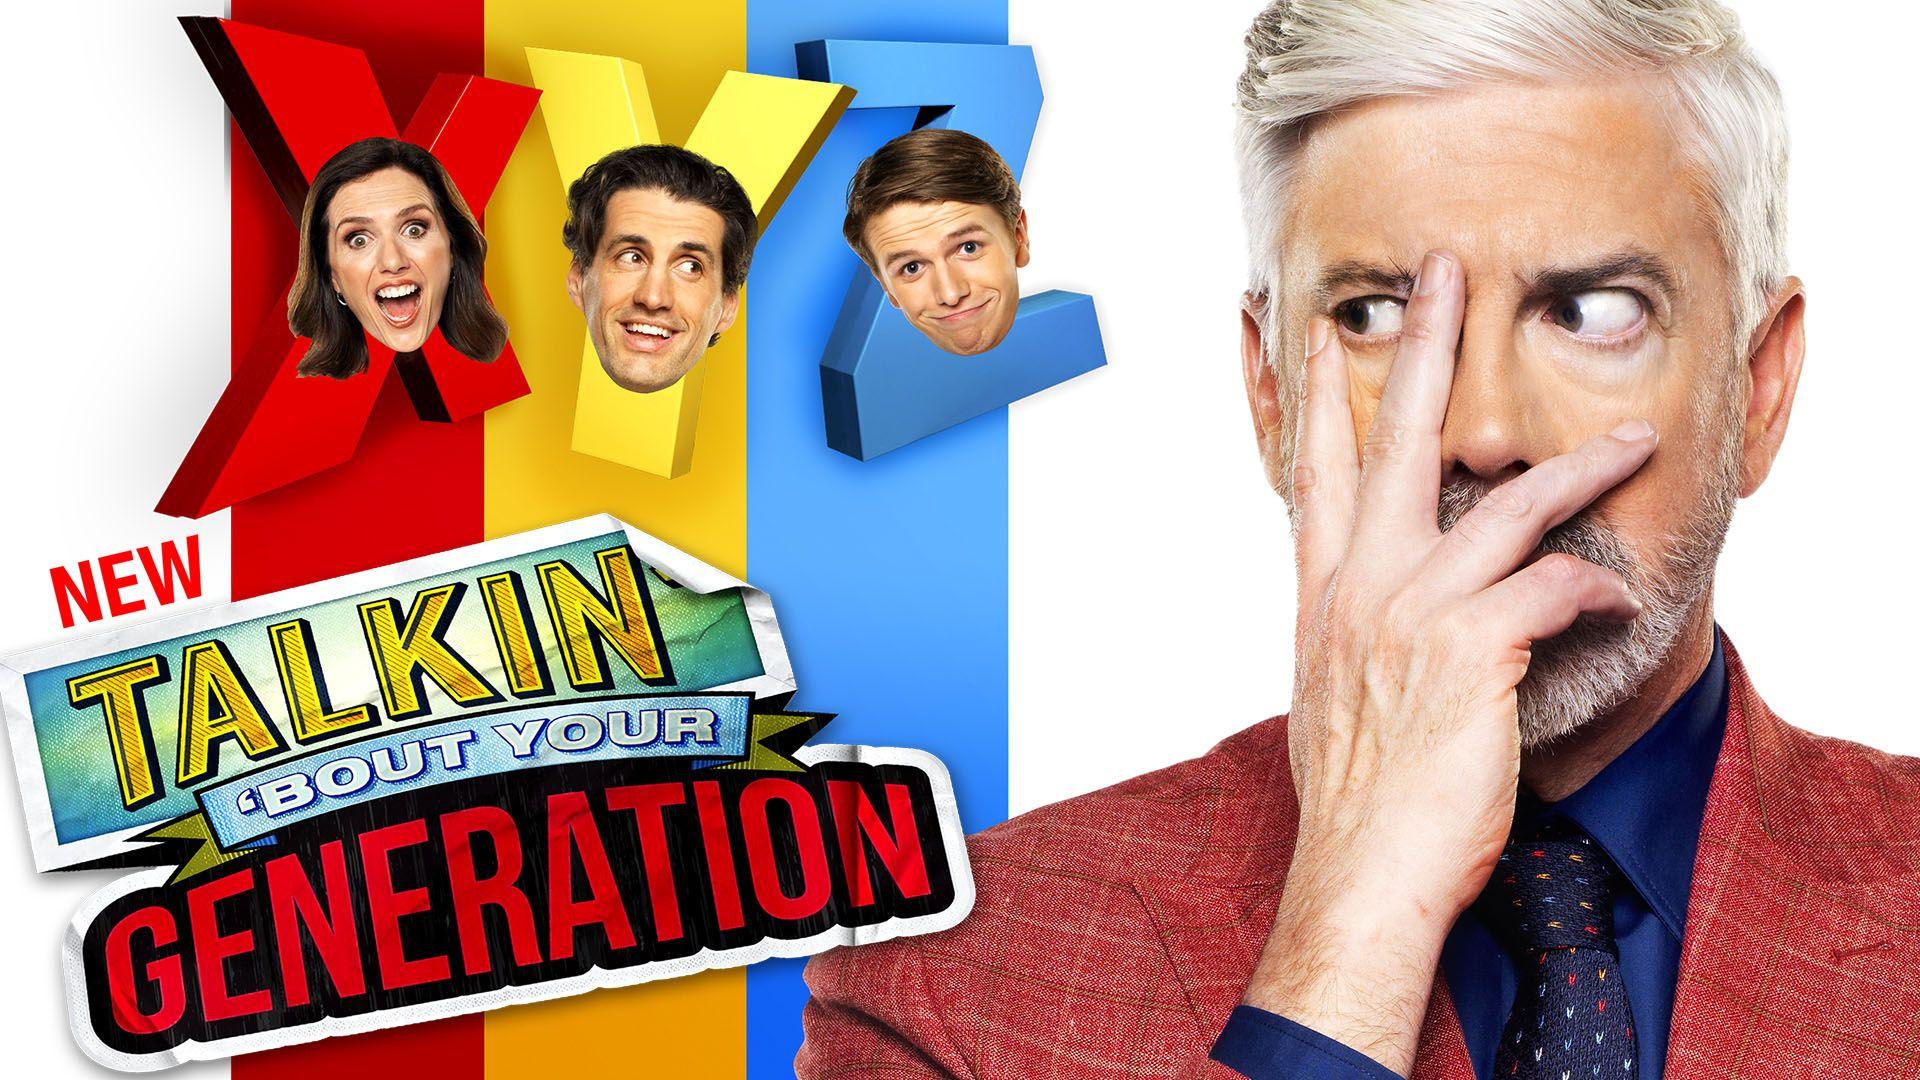 Talkin' Bout Your Generation  Source: Nine Entertainment Co